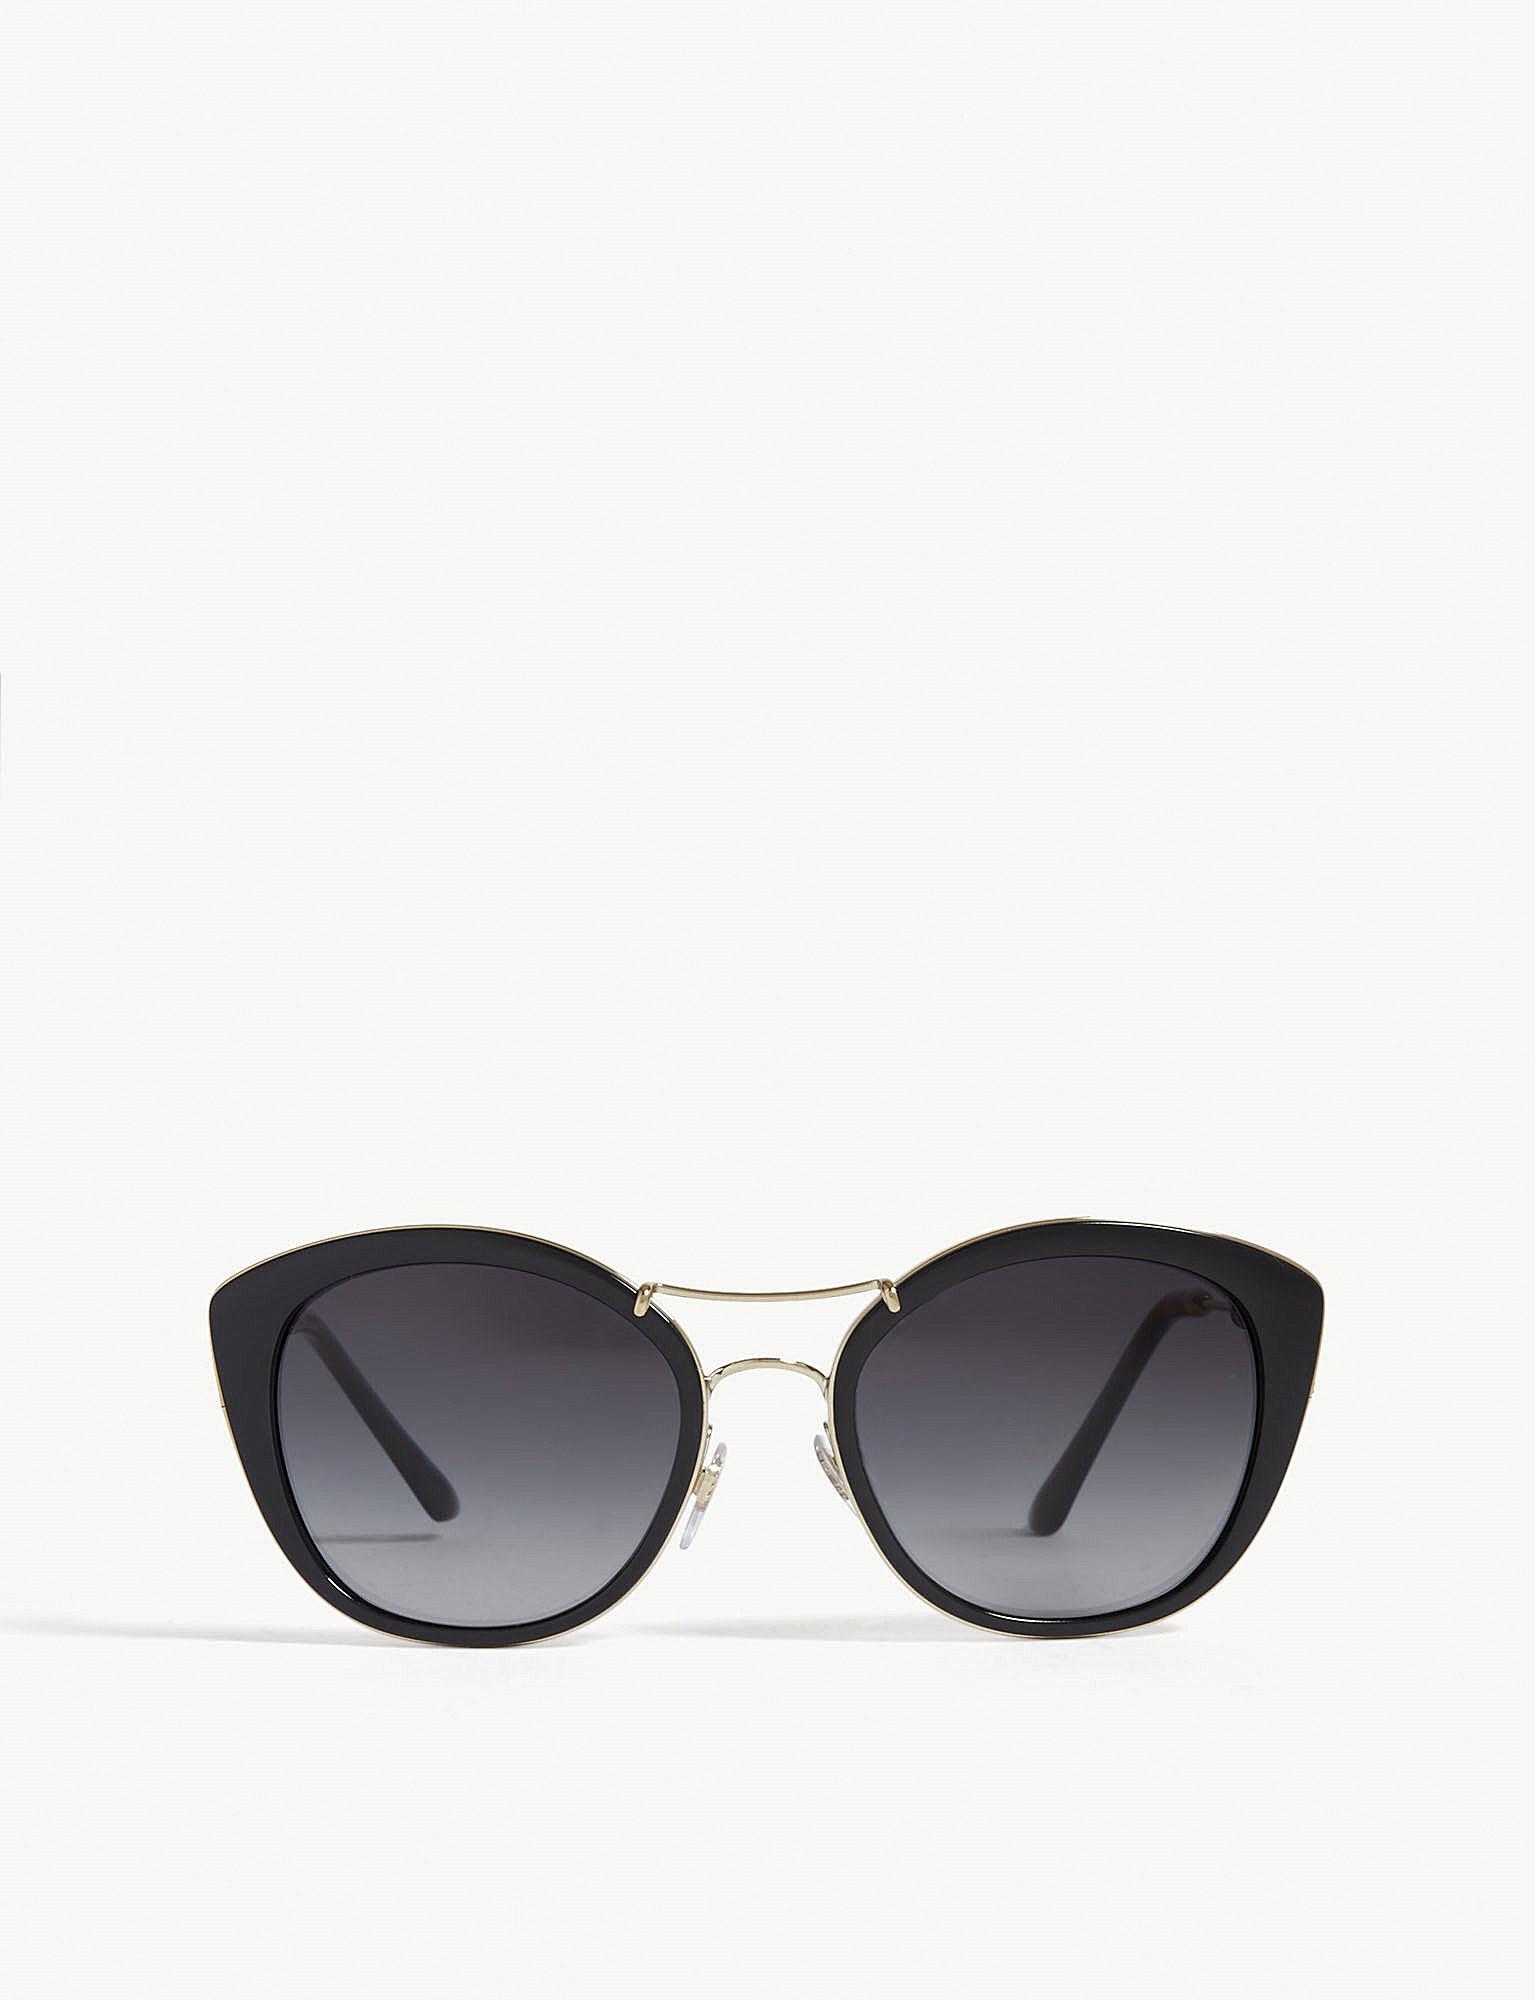 5e1c66a70446 Lyst - Burberry B4251 Cat-eye Sunglasses